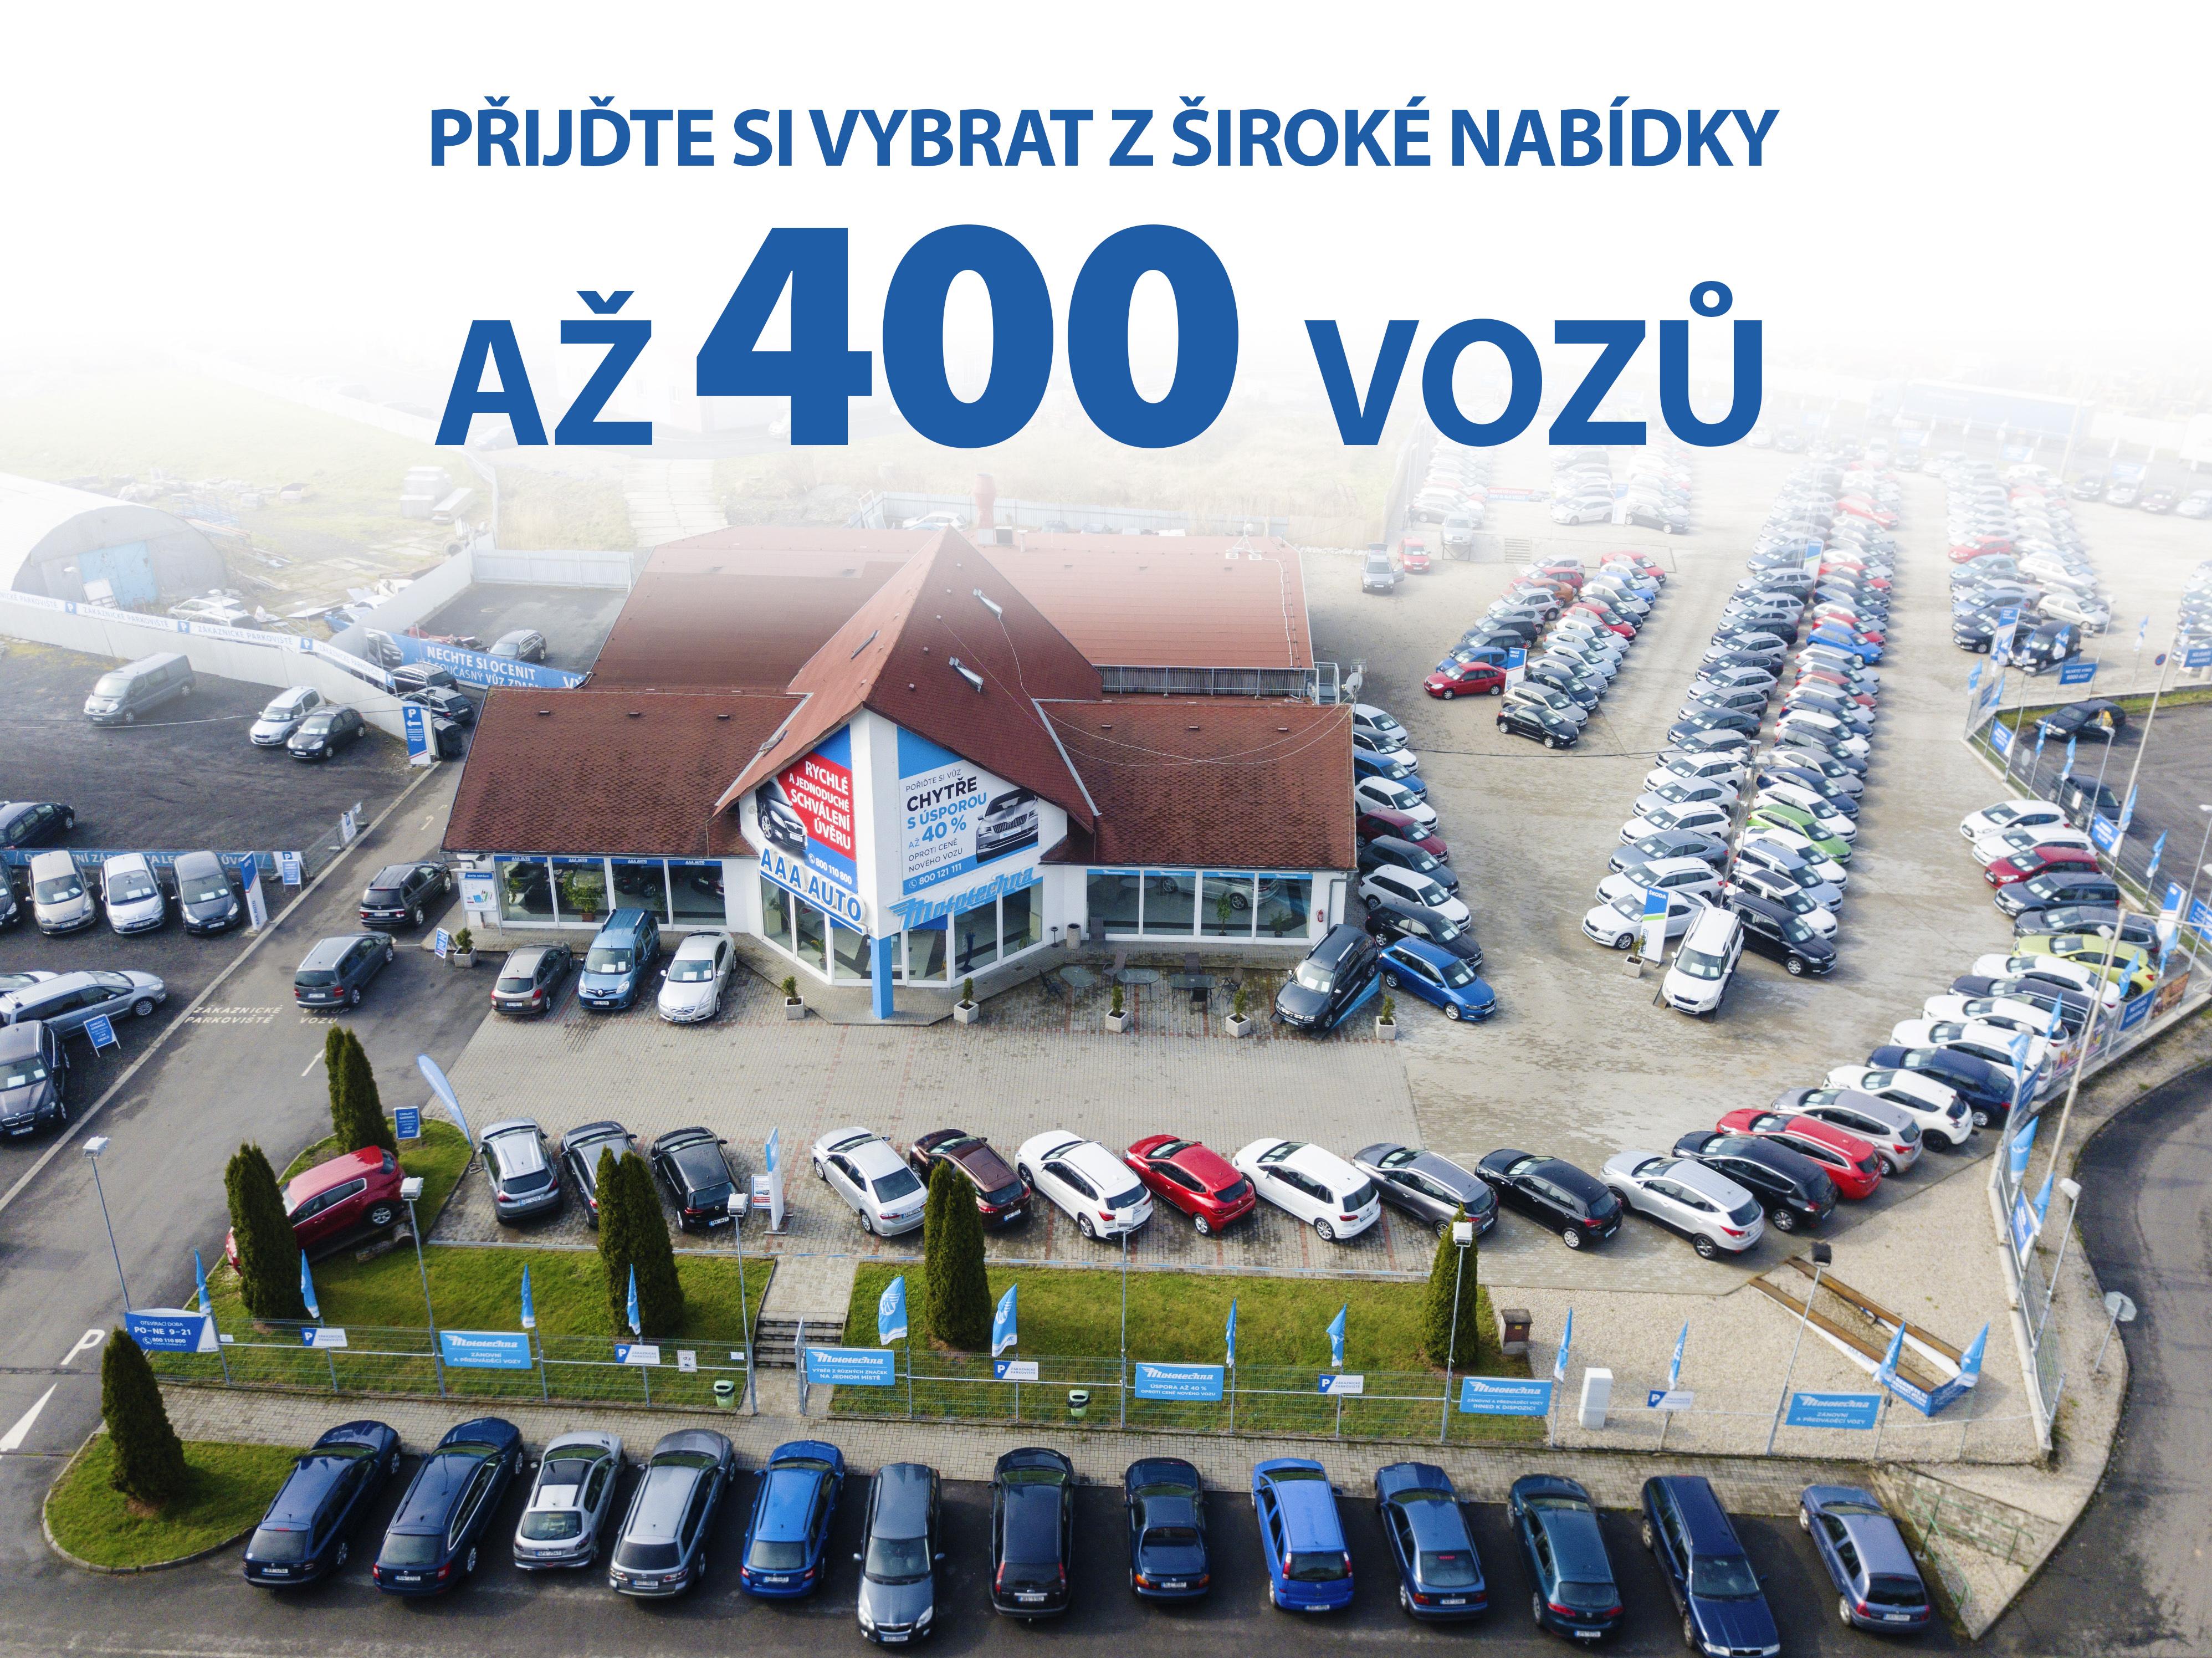 AAA Auto SOKOLOV  ec39a5690a1